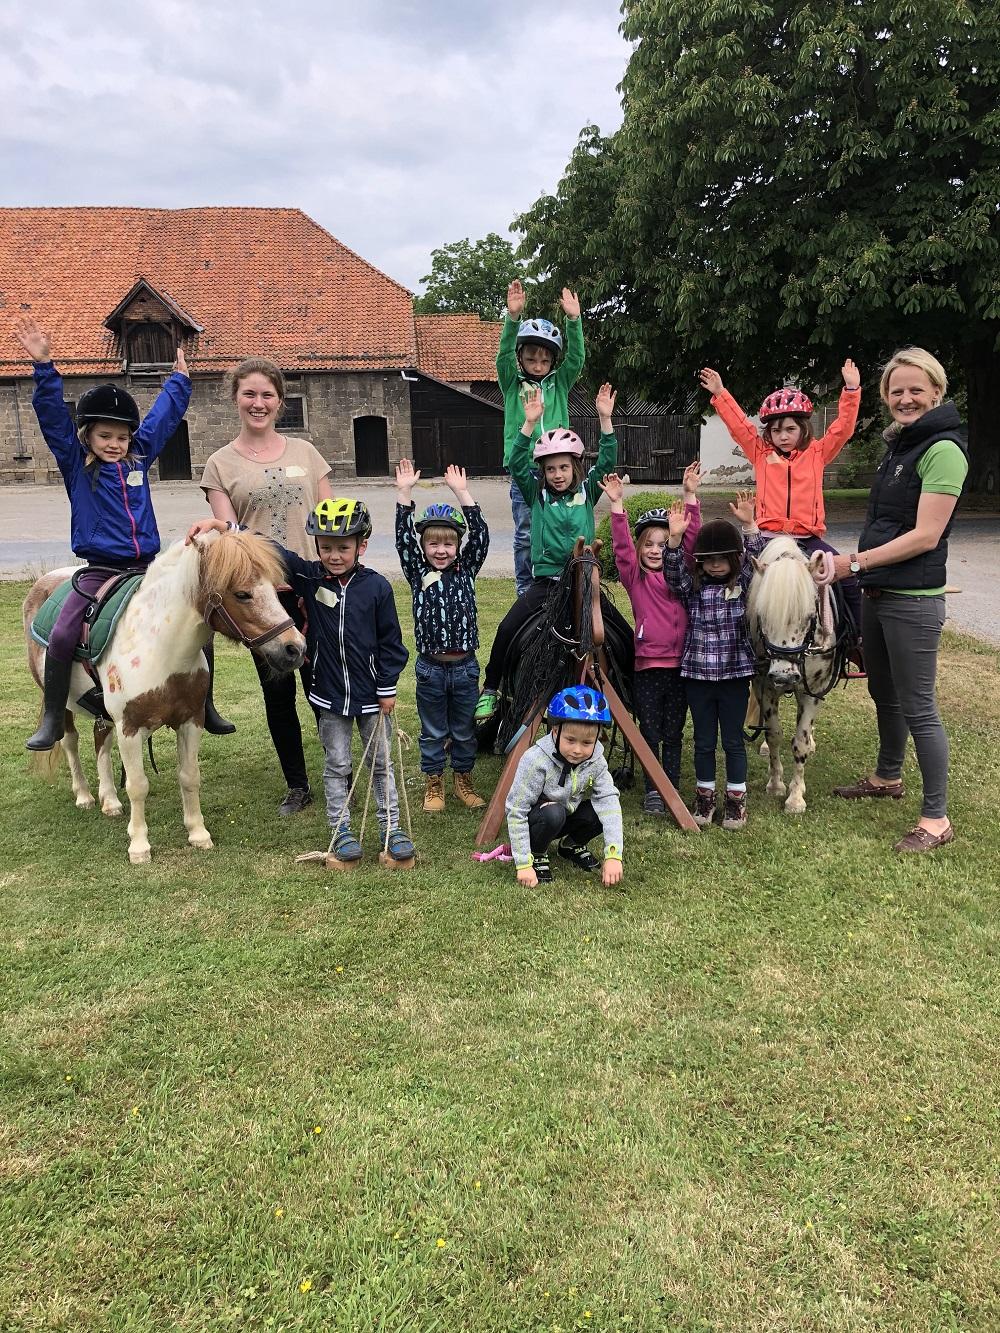 Gruppenbild: Kinder, Ponys, Holzpferd